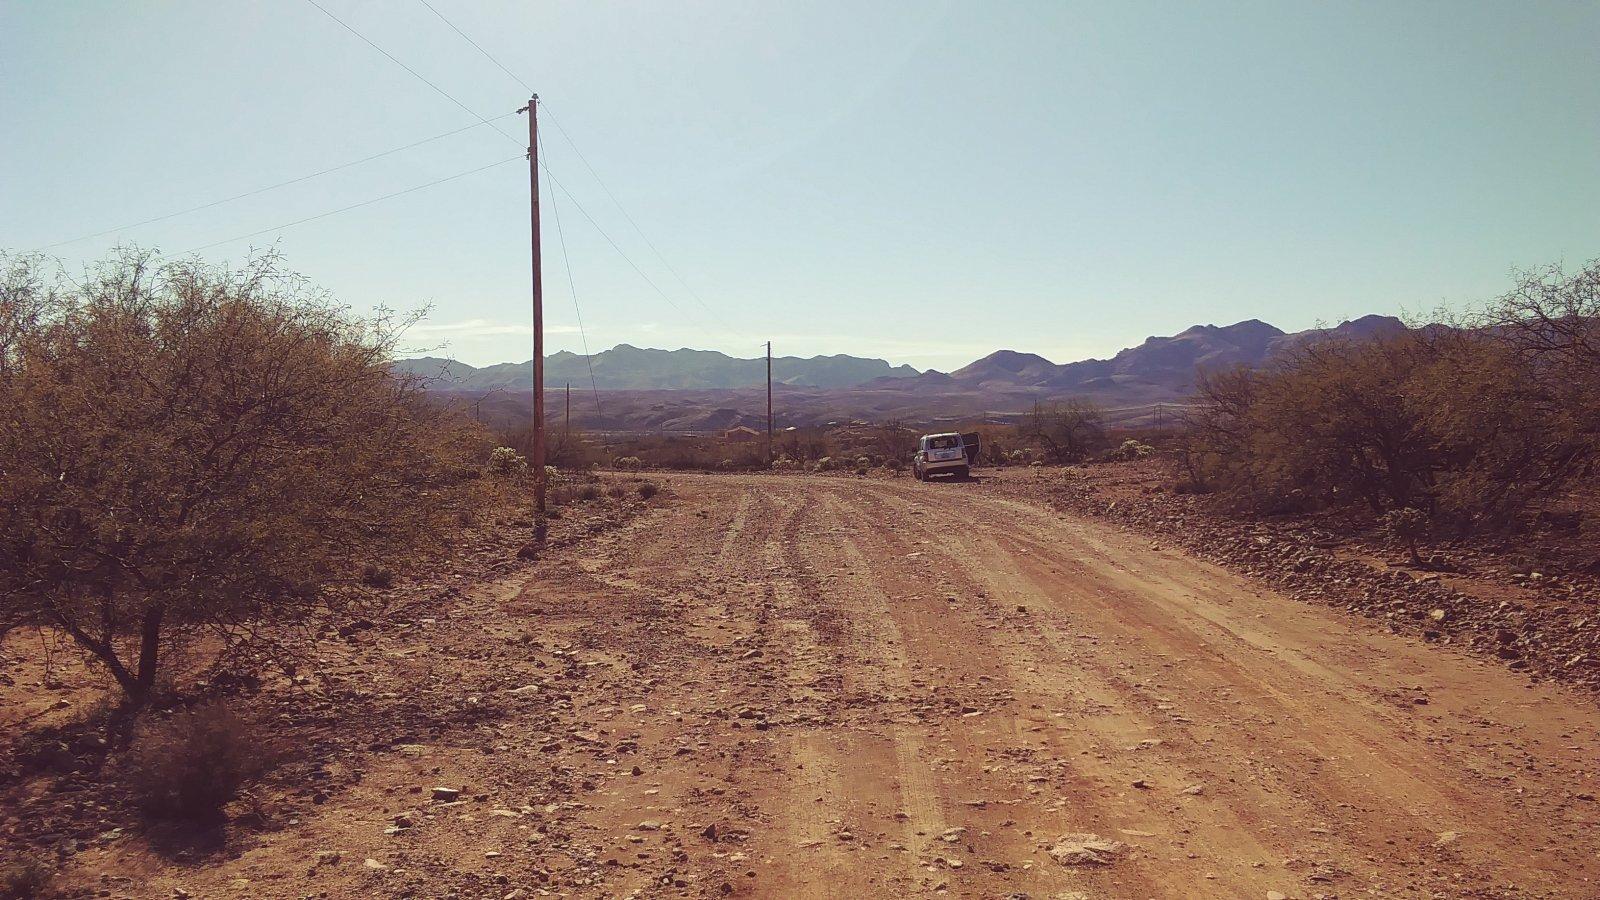 Facing West at the corner of Via Medusa and Linda Ct